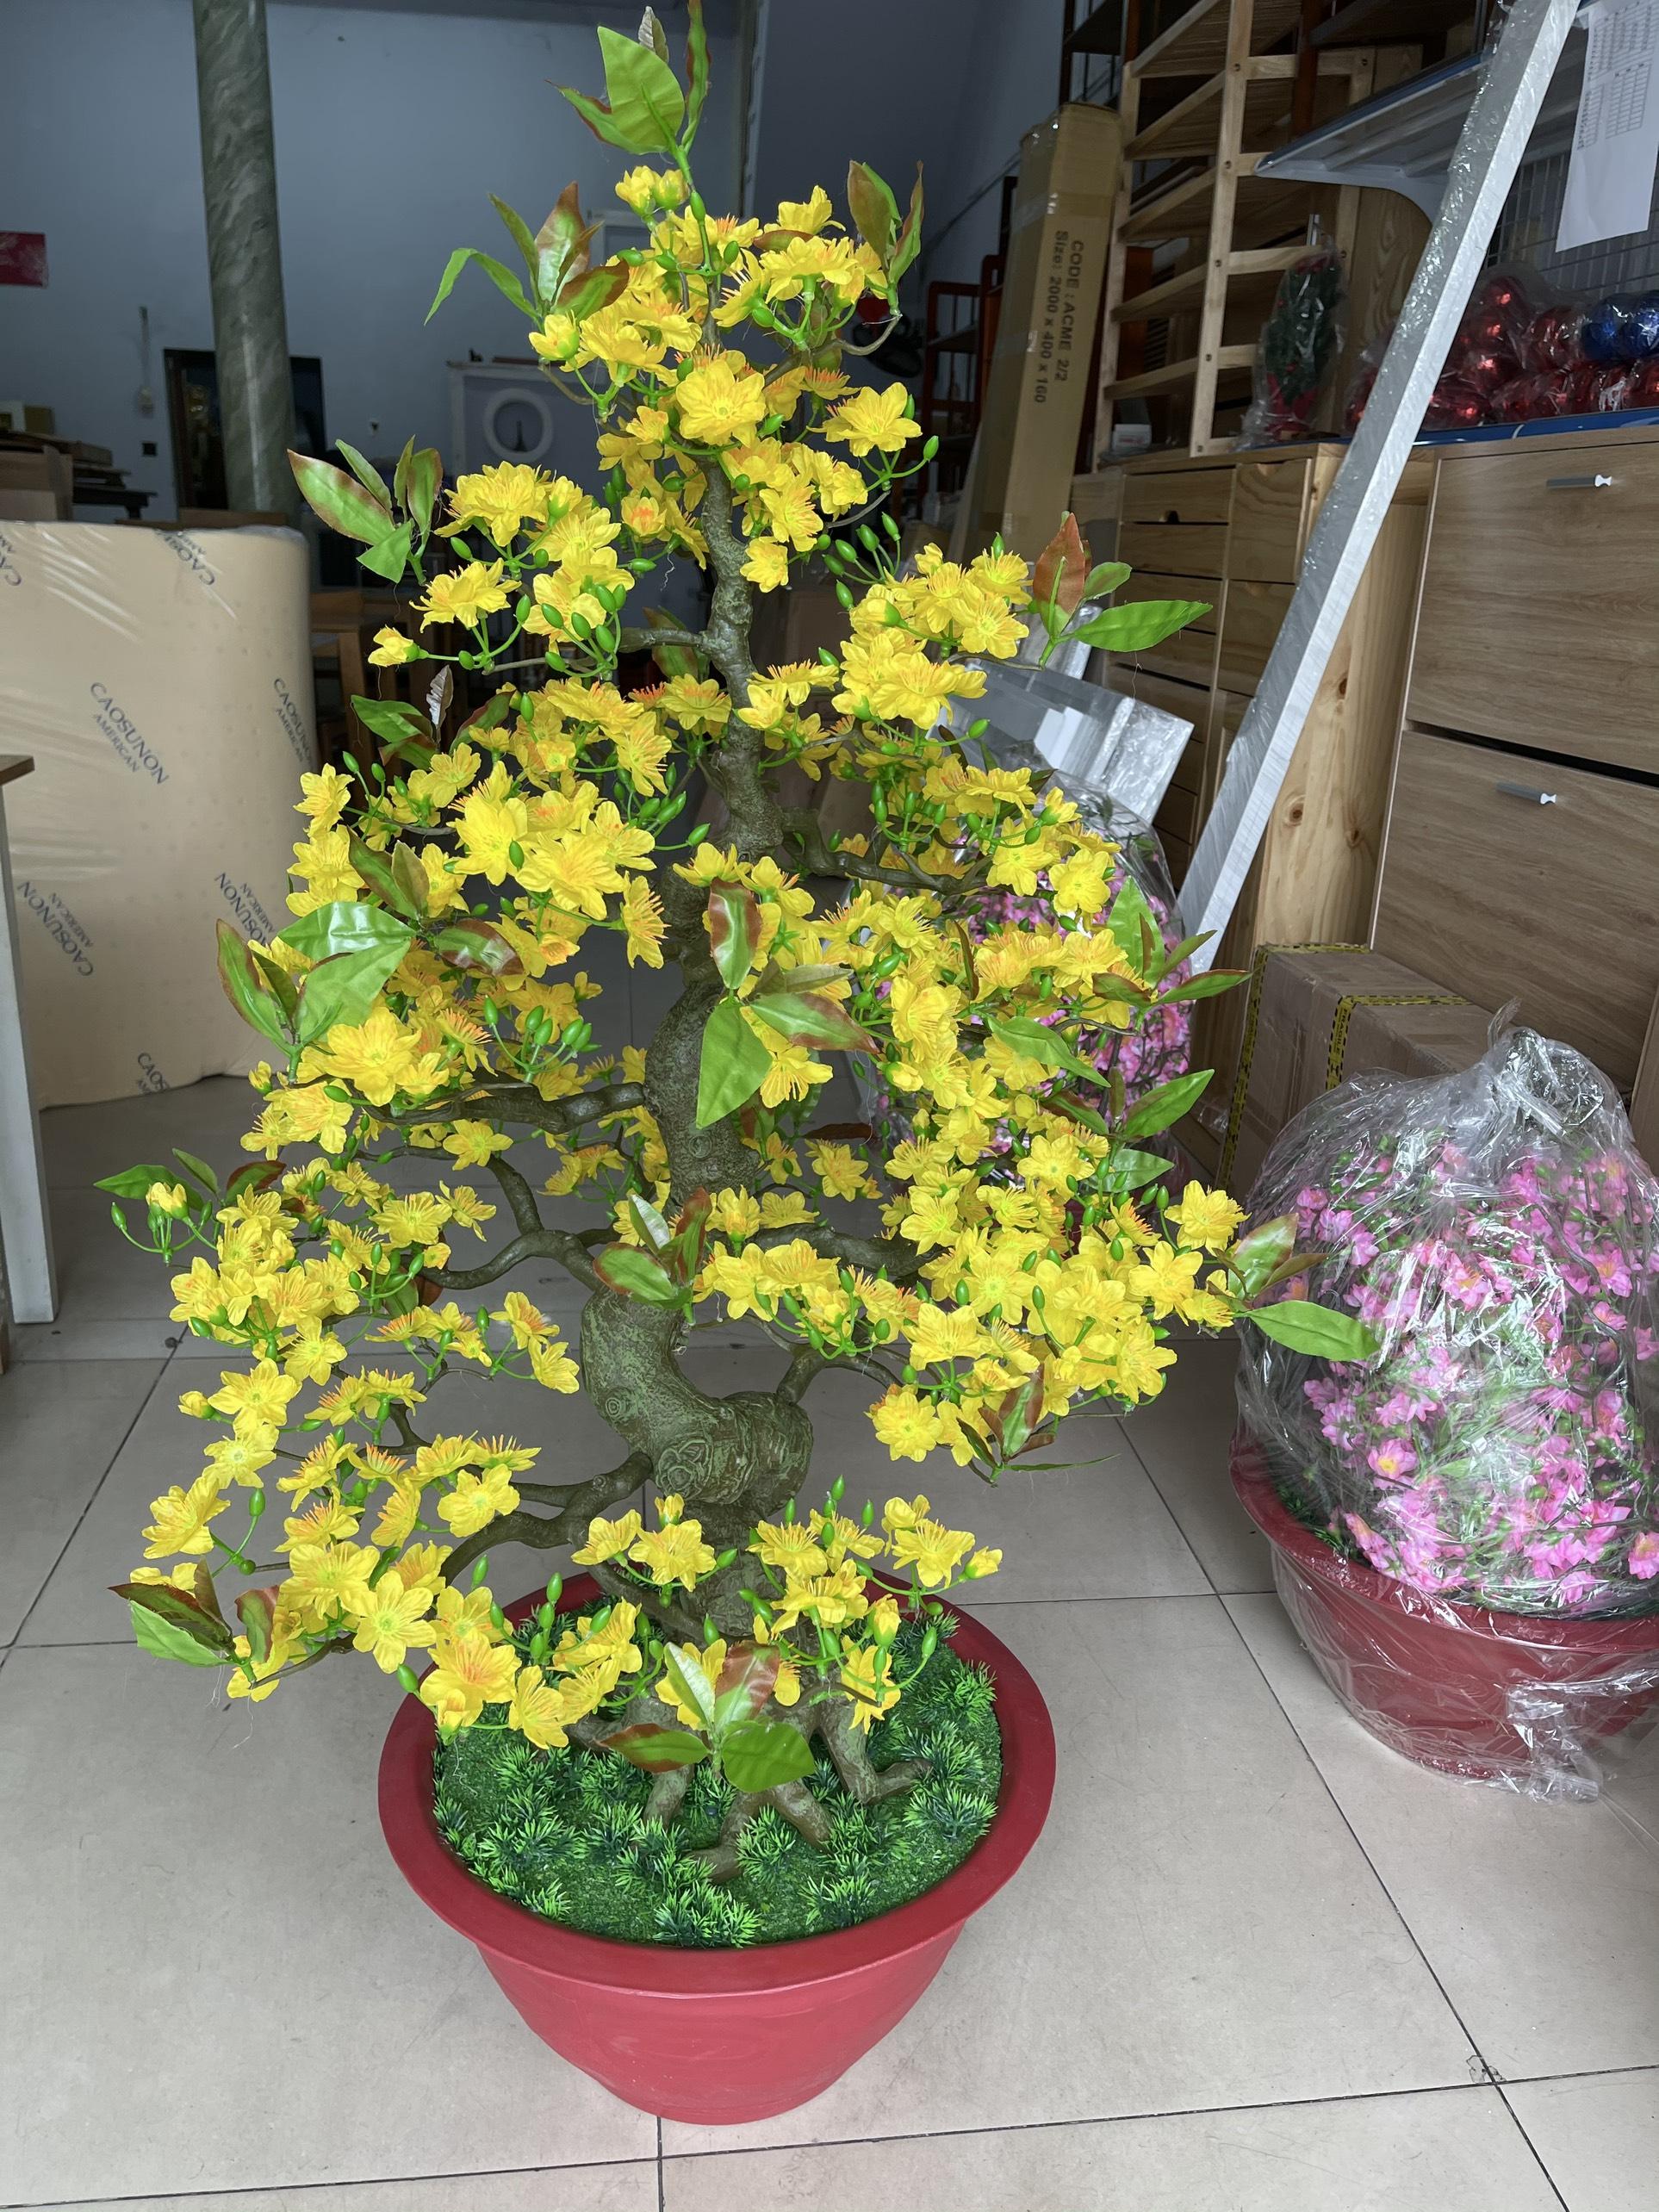 Cây Hoa Mai Bonsai Giả Cao 1m25 Chậu Hoa Mai Trang Trí Tết